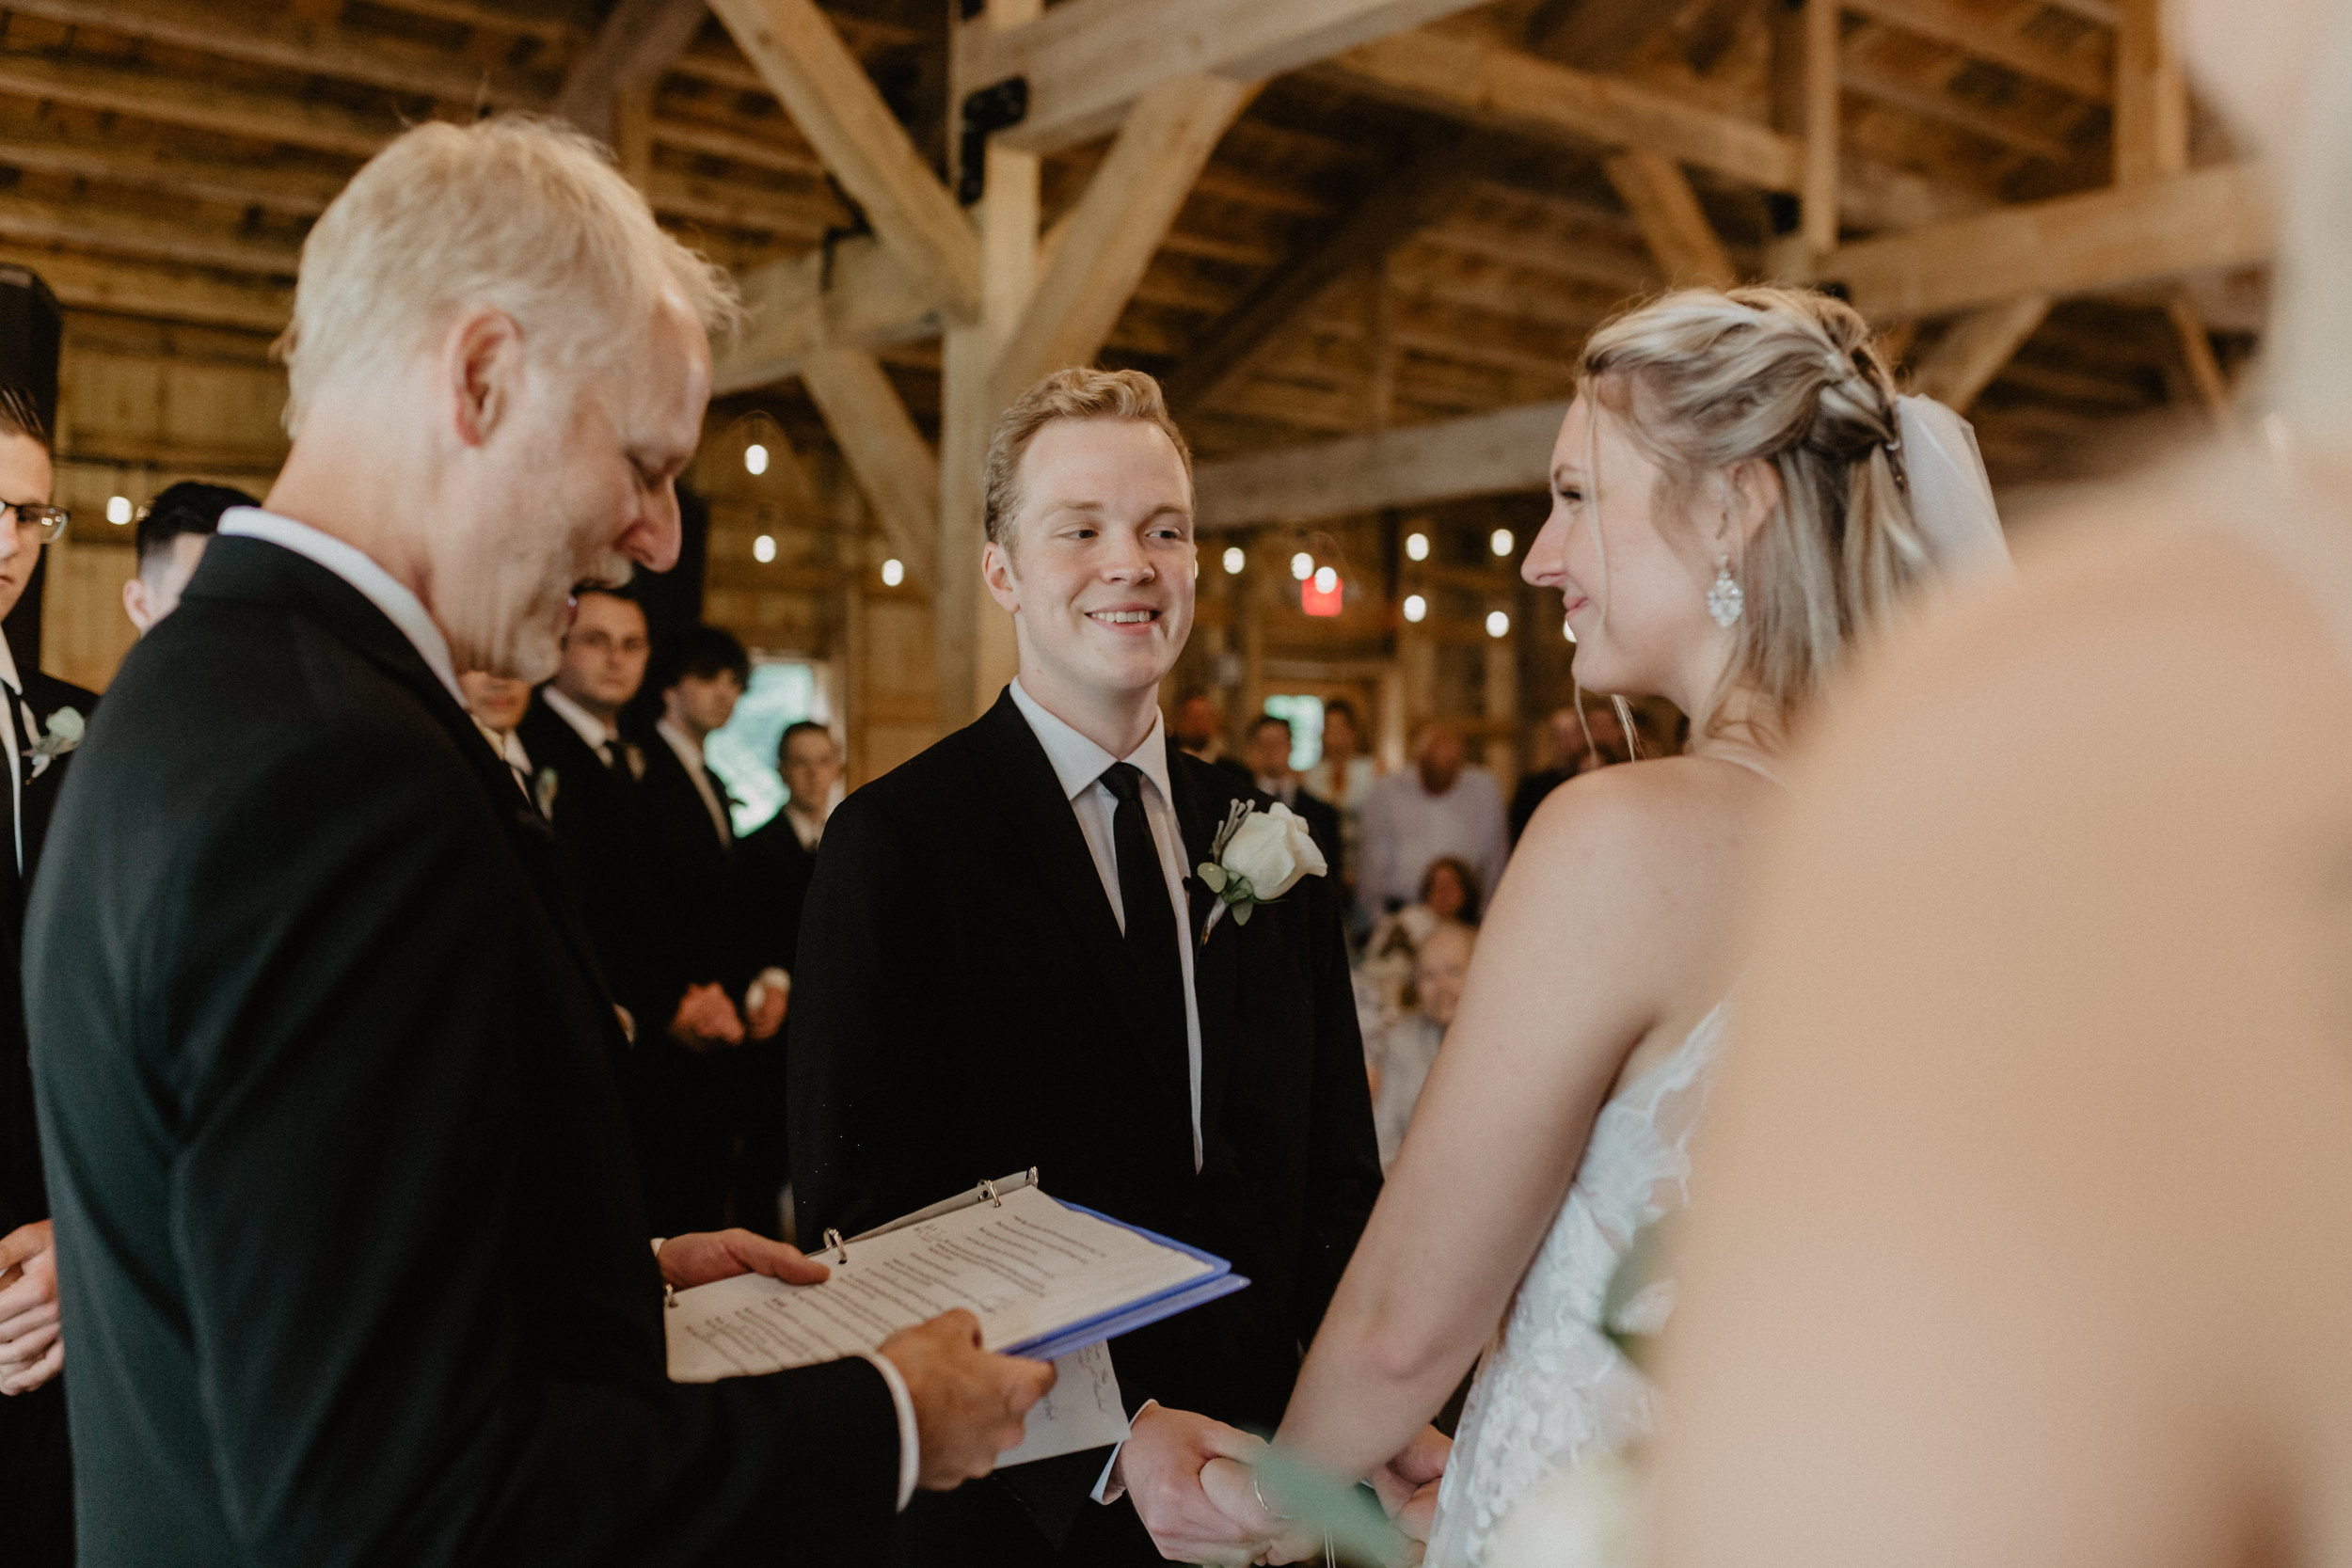 greywacke-meadows-wedding-38.jpg